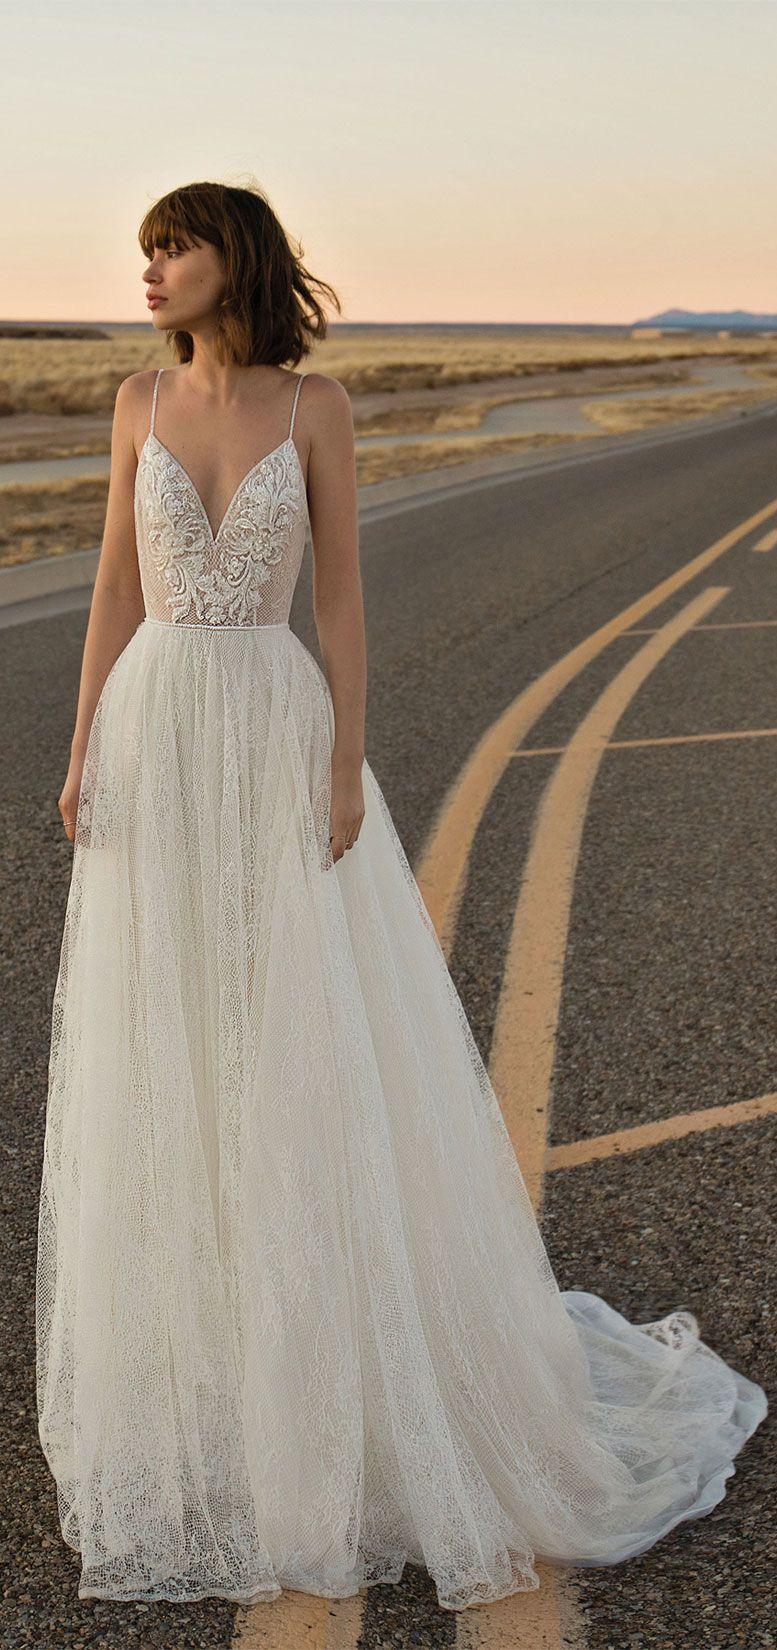 Flora Bride - Siren Of The Desert 2019 Bridal Collection, boho wedding dress, bohemian wedding gown ,a-line wedding dress,spaghetti straps wedding gown #wedding #weddingdress #weddinggown #bridedress